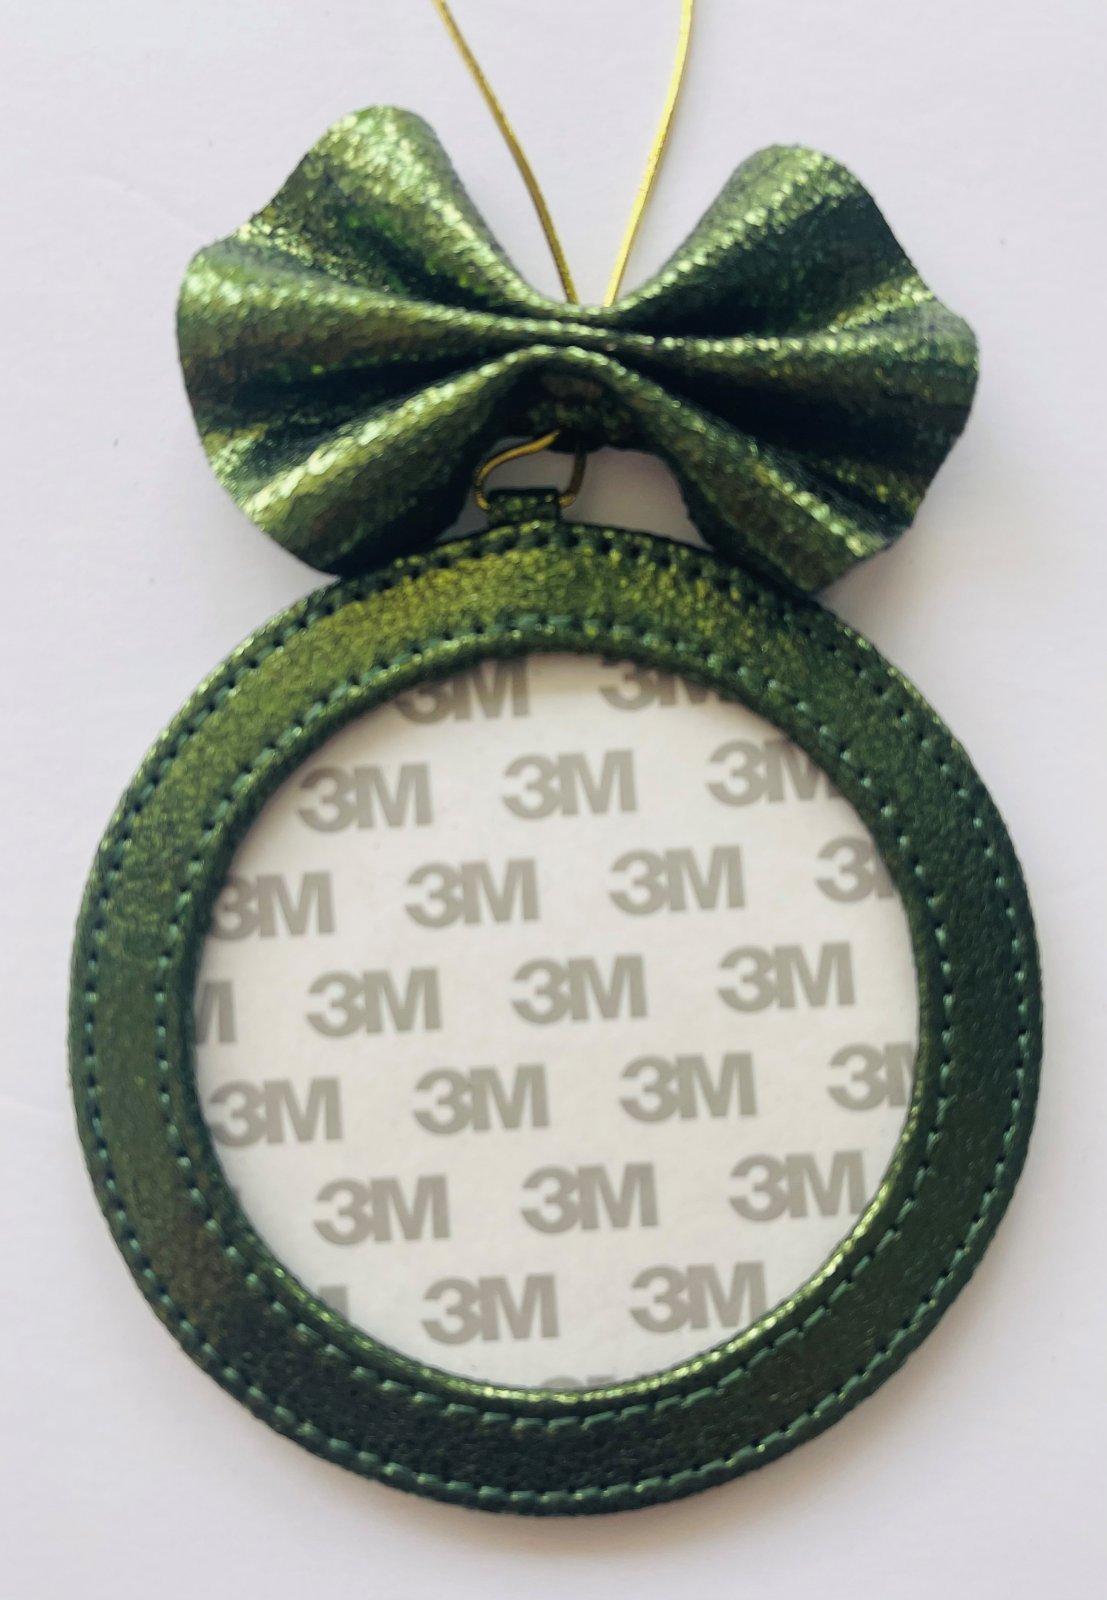 4 Round Holiday Ornament -  Fern Foil